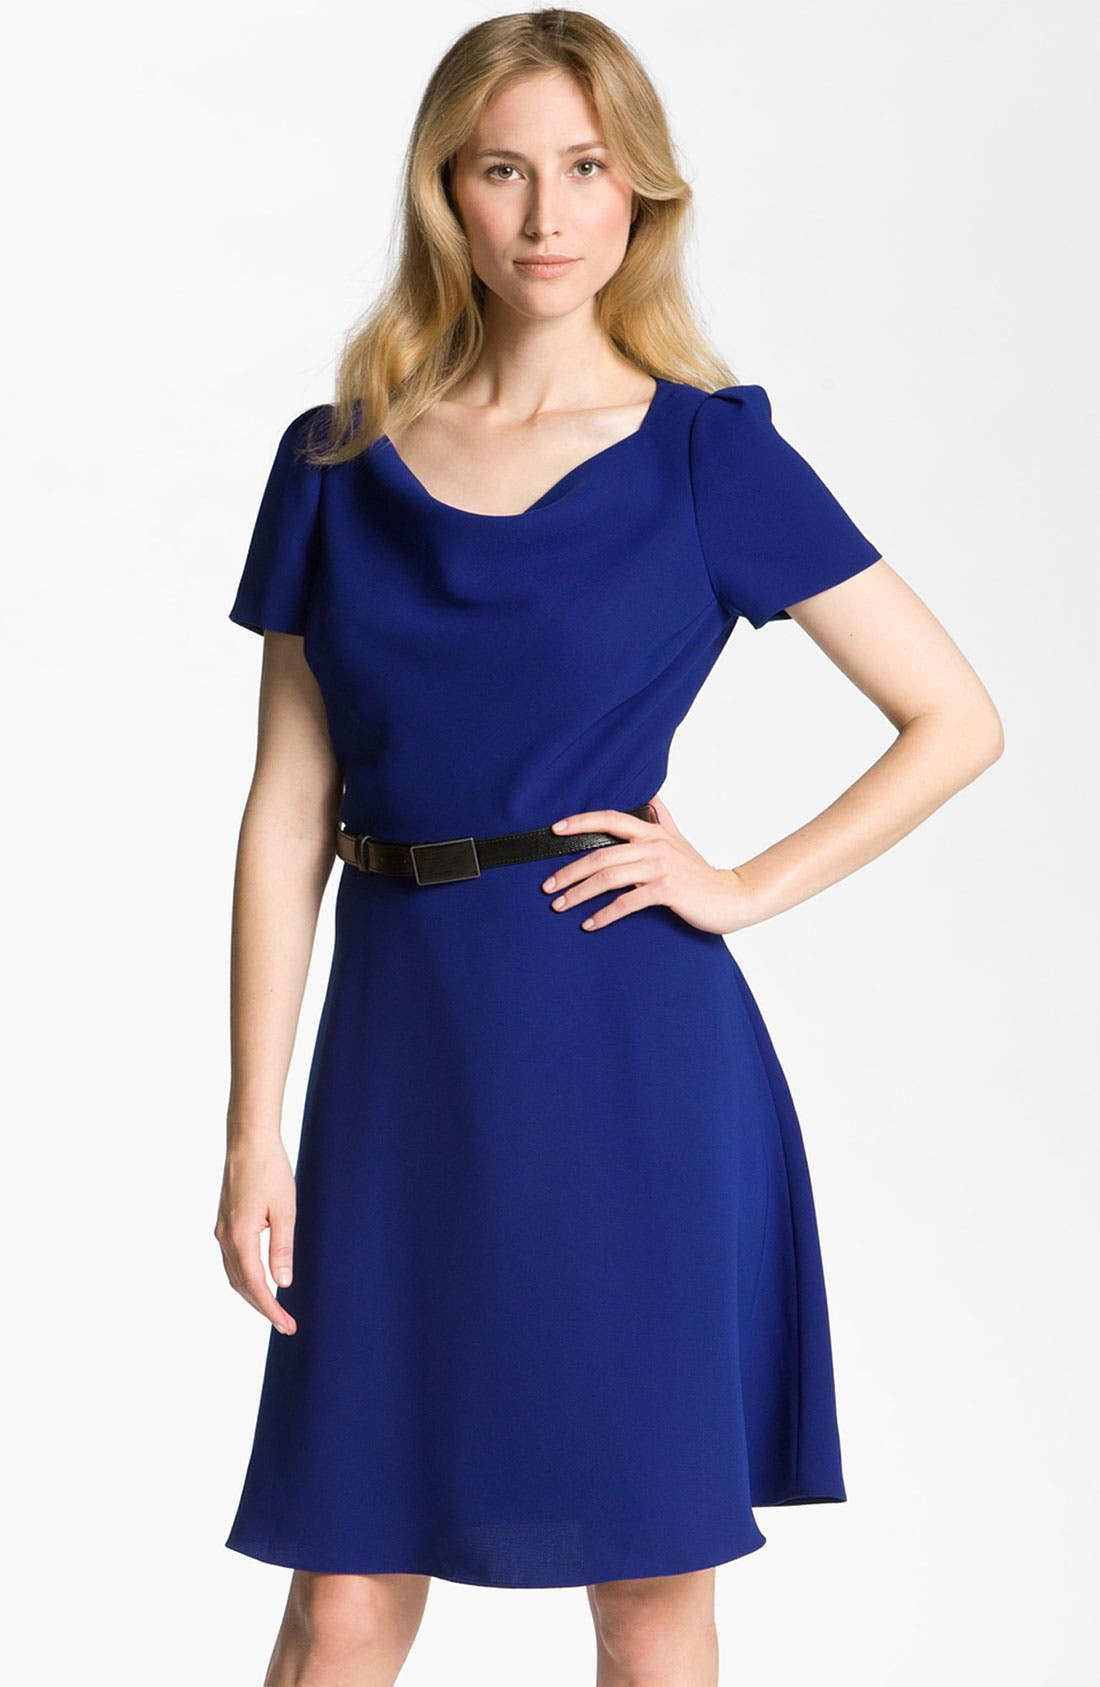 Alternate Image 1 Selected - Tahari by Arthur S. Levine Drape Neck Crepe Fit & Flare Dress